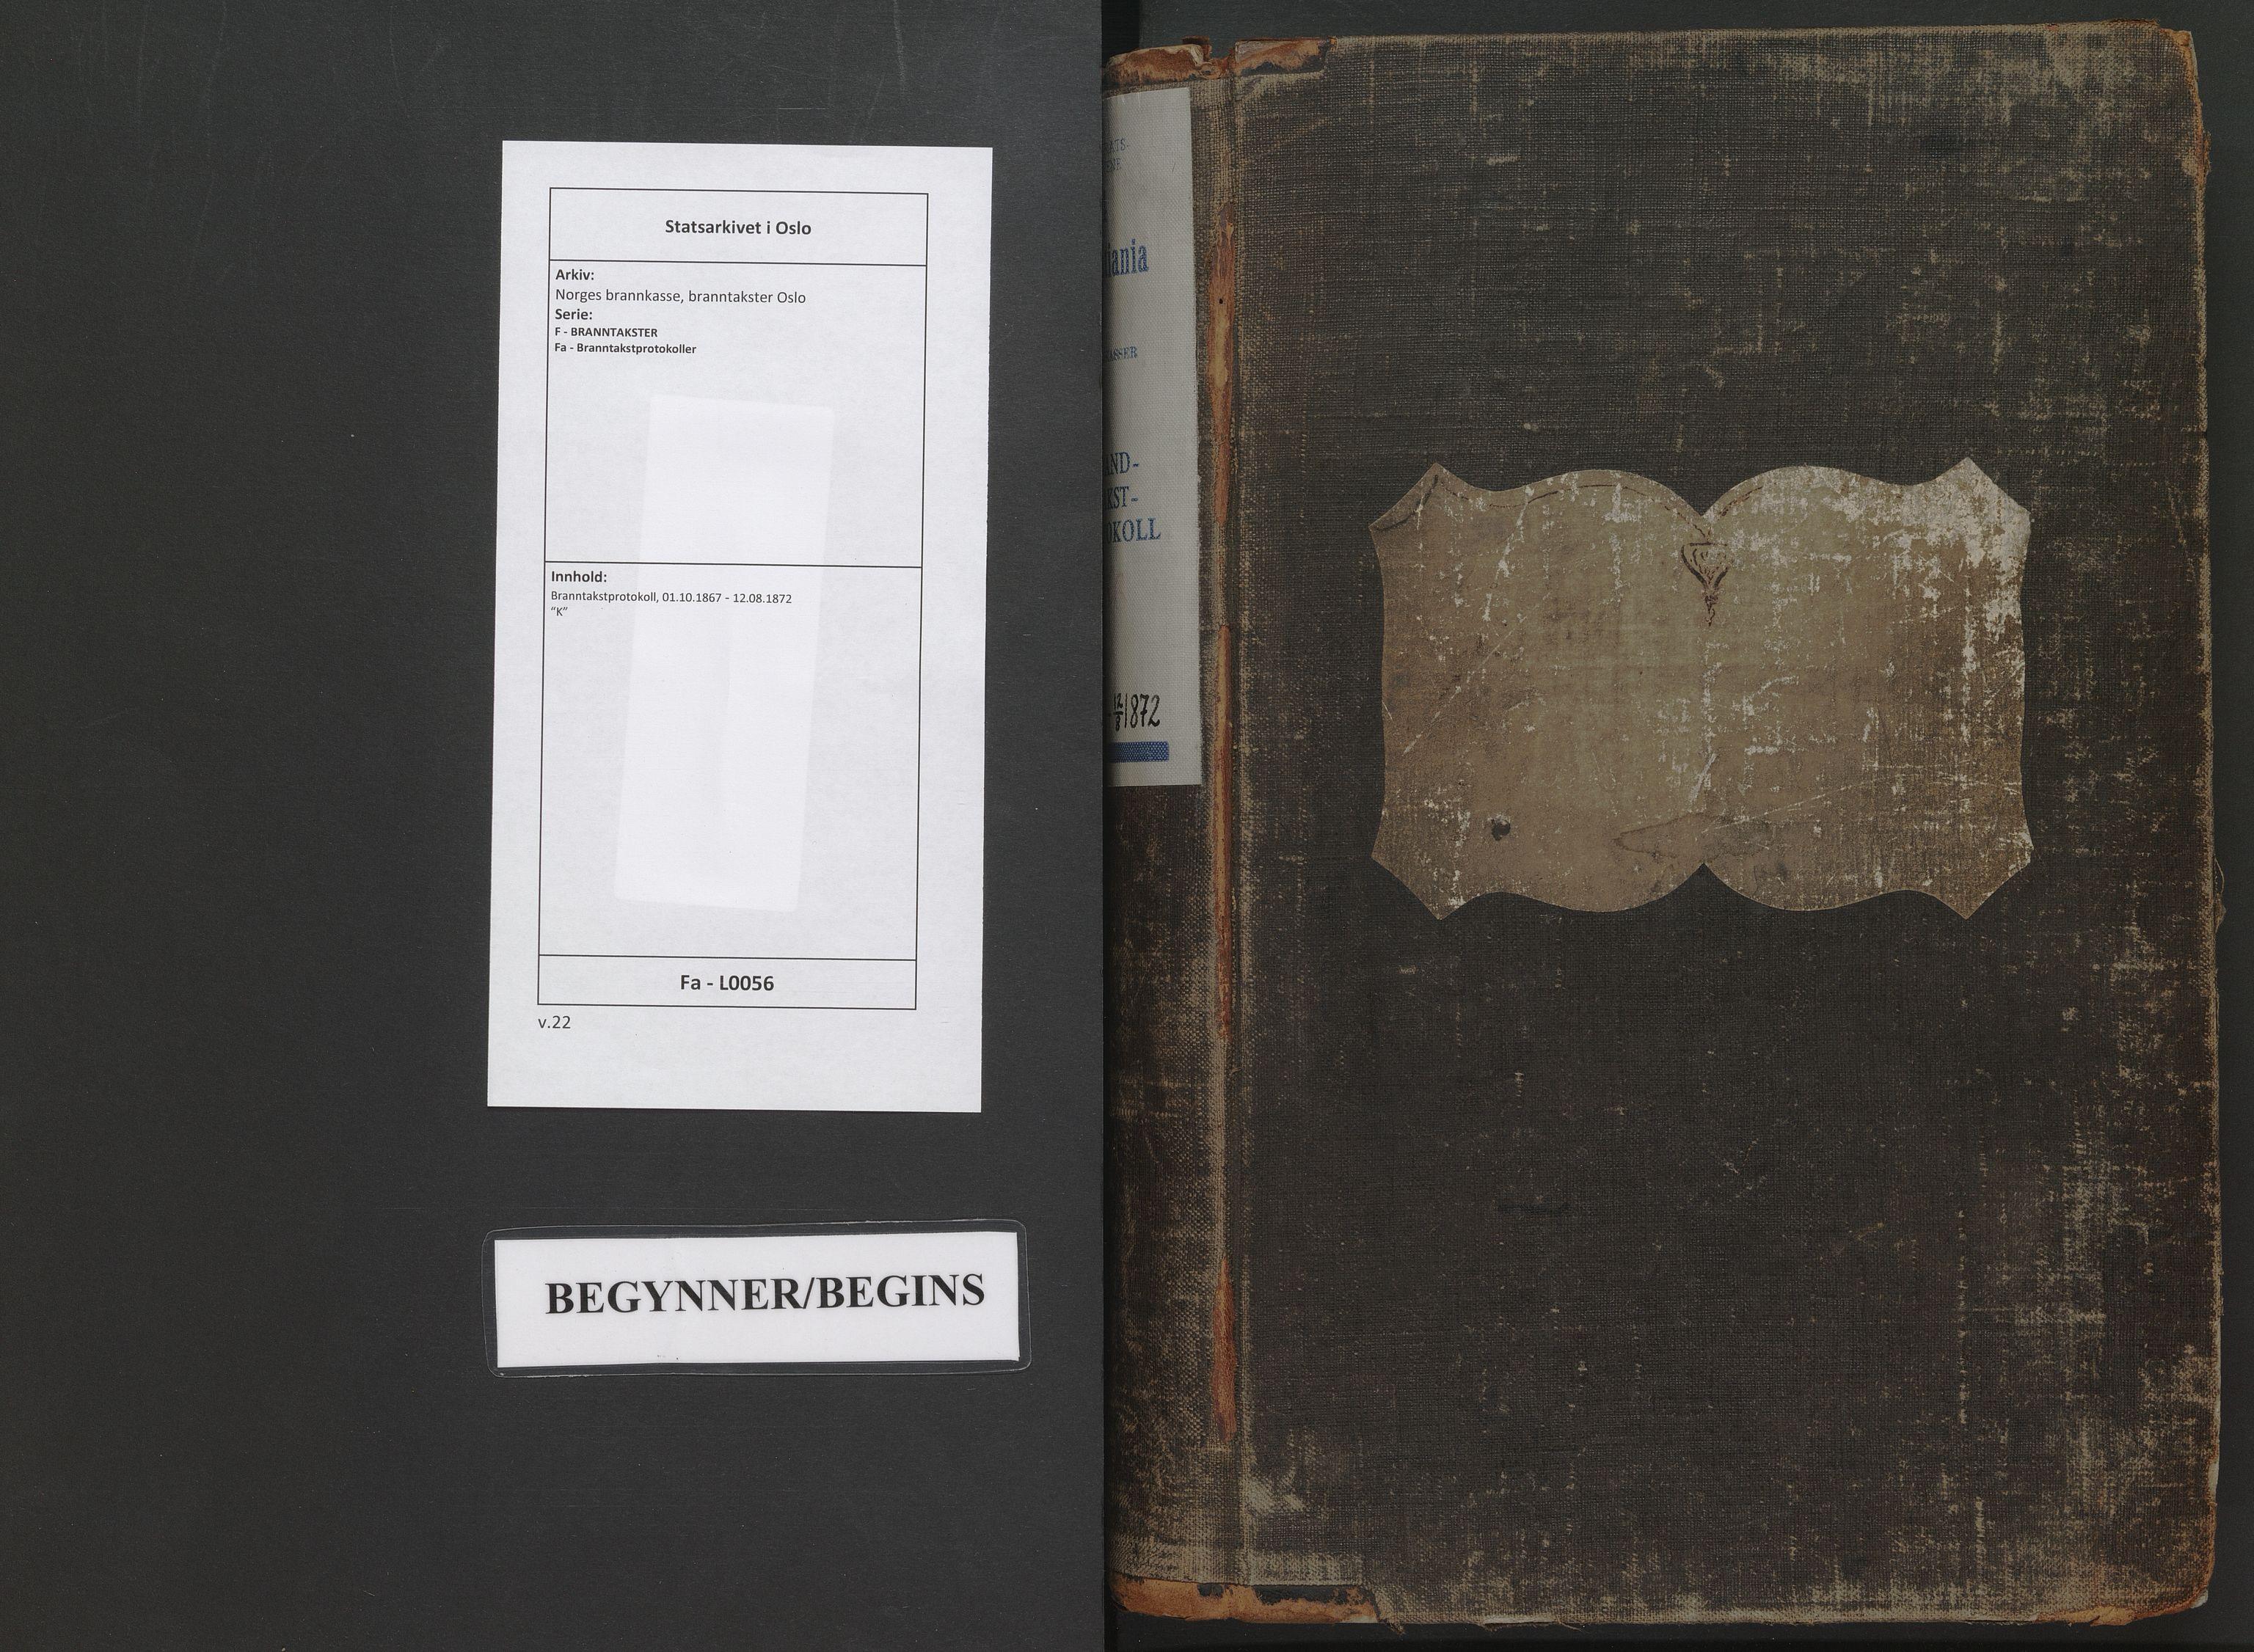 SAO, Norges brannkasse, branntakster Oslo, F/Fa/L0056: Branntakstprotokoll, 1867-1872